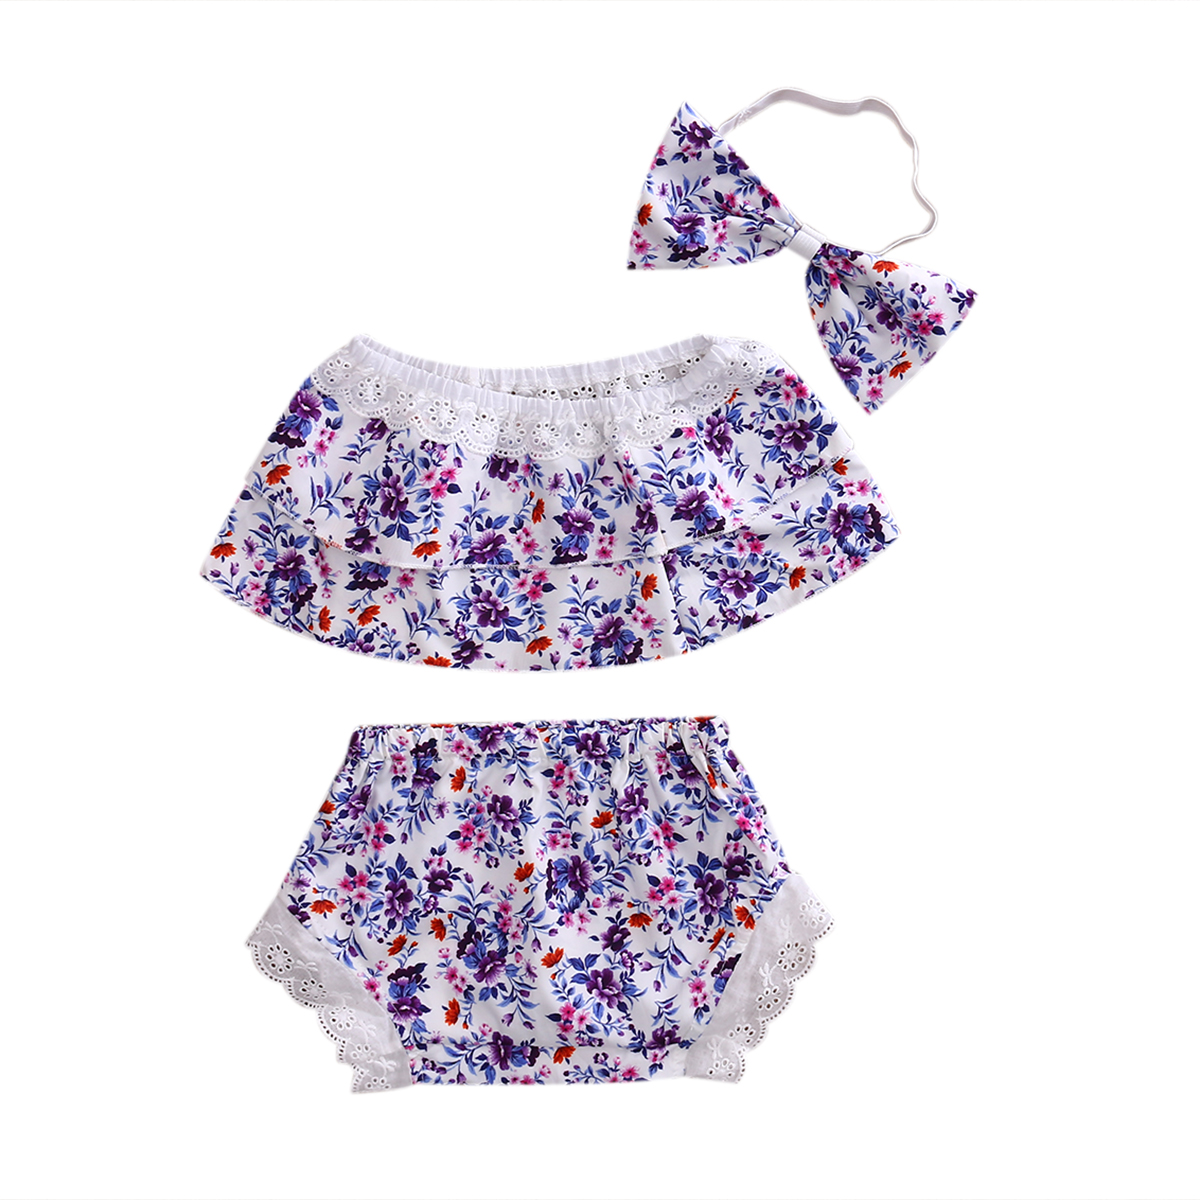 3Pcs/Set Newborn Toddler Kids Baby Girls Purple Floral Tube Top +Lace Shorts +Headband 3Pcs Outfit Sets Clothes